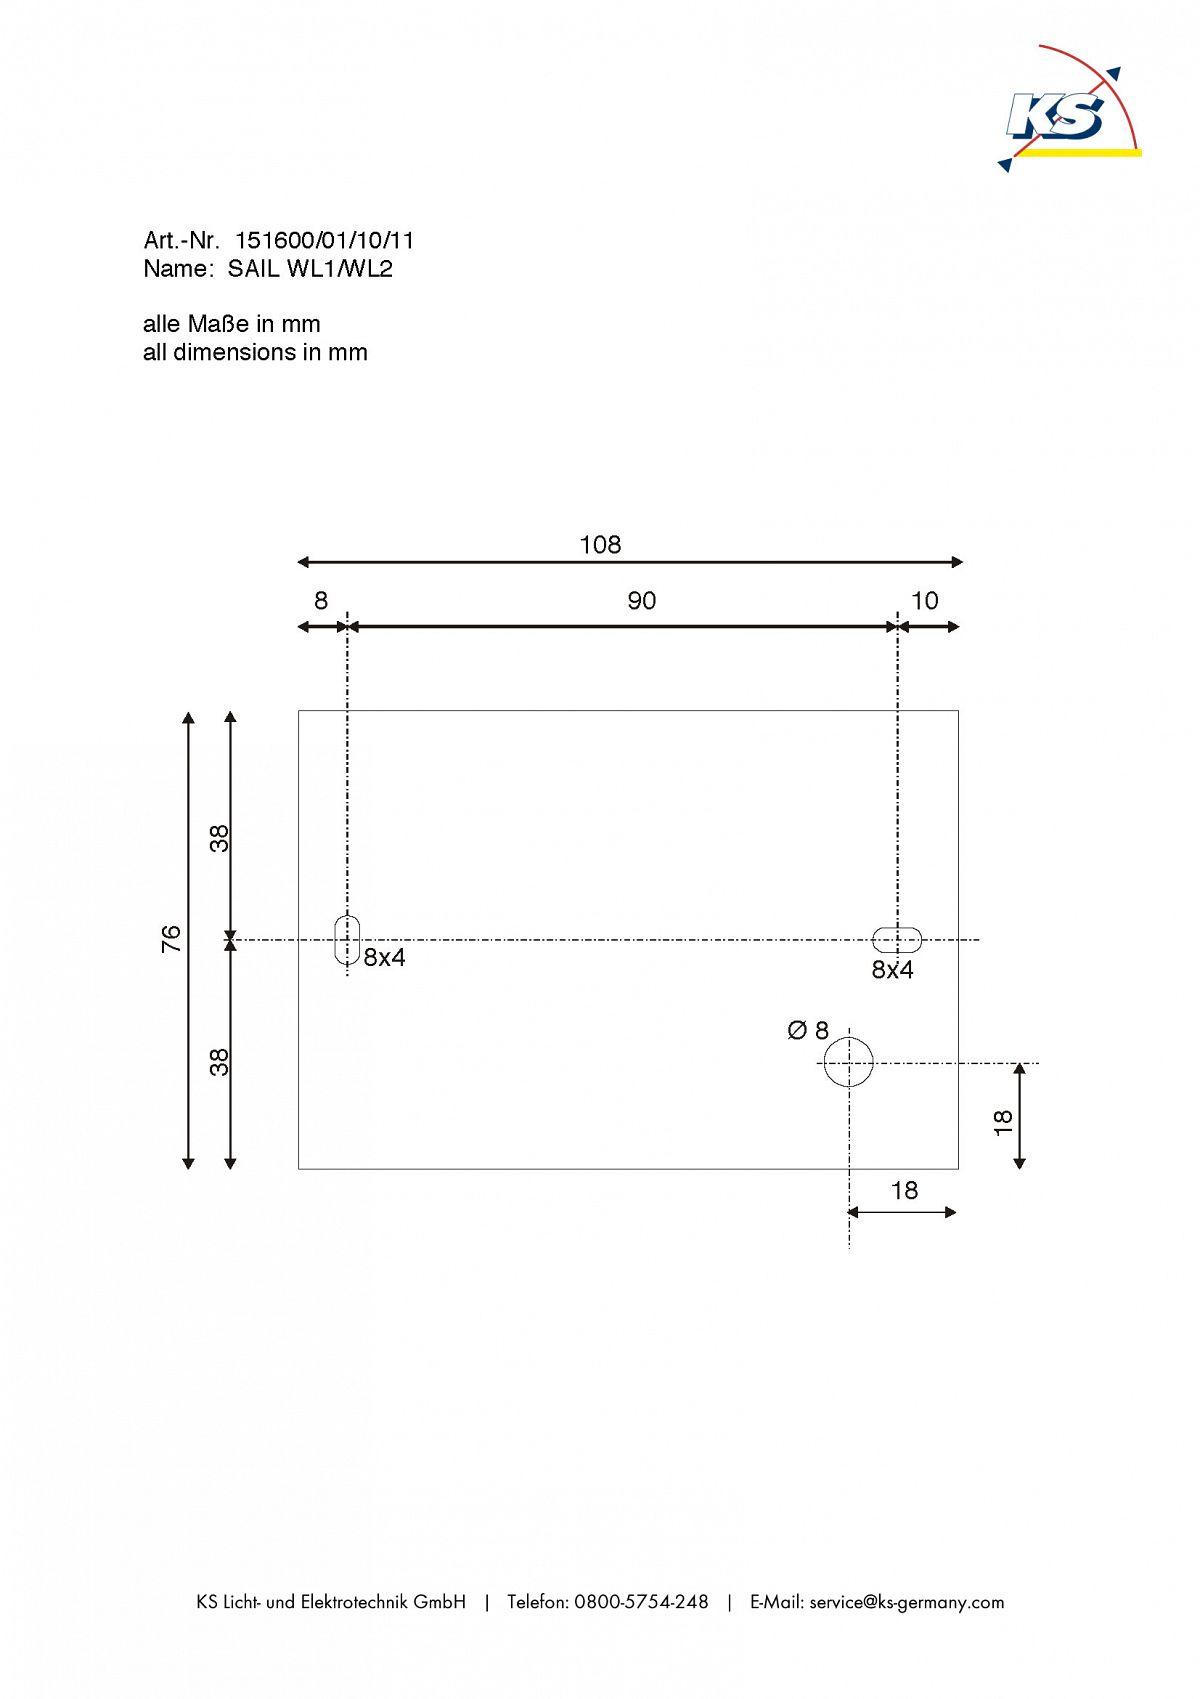 wandleuchte led sail 2 wl 2 2x3w led warmwei schwarz. Black Bedroom Furniture Sets. Home Design Ideas